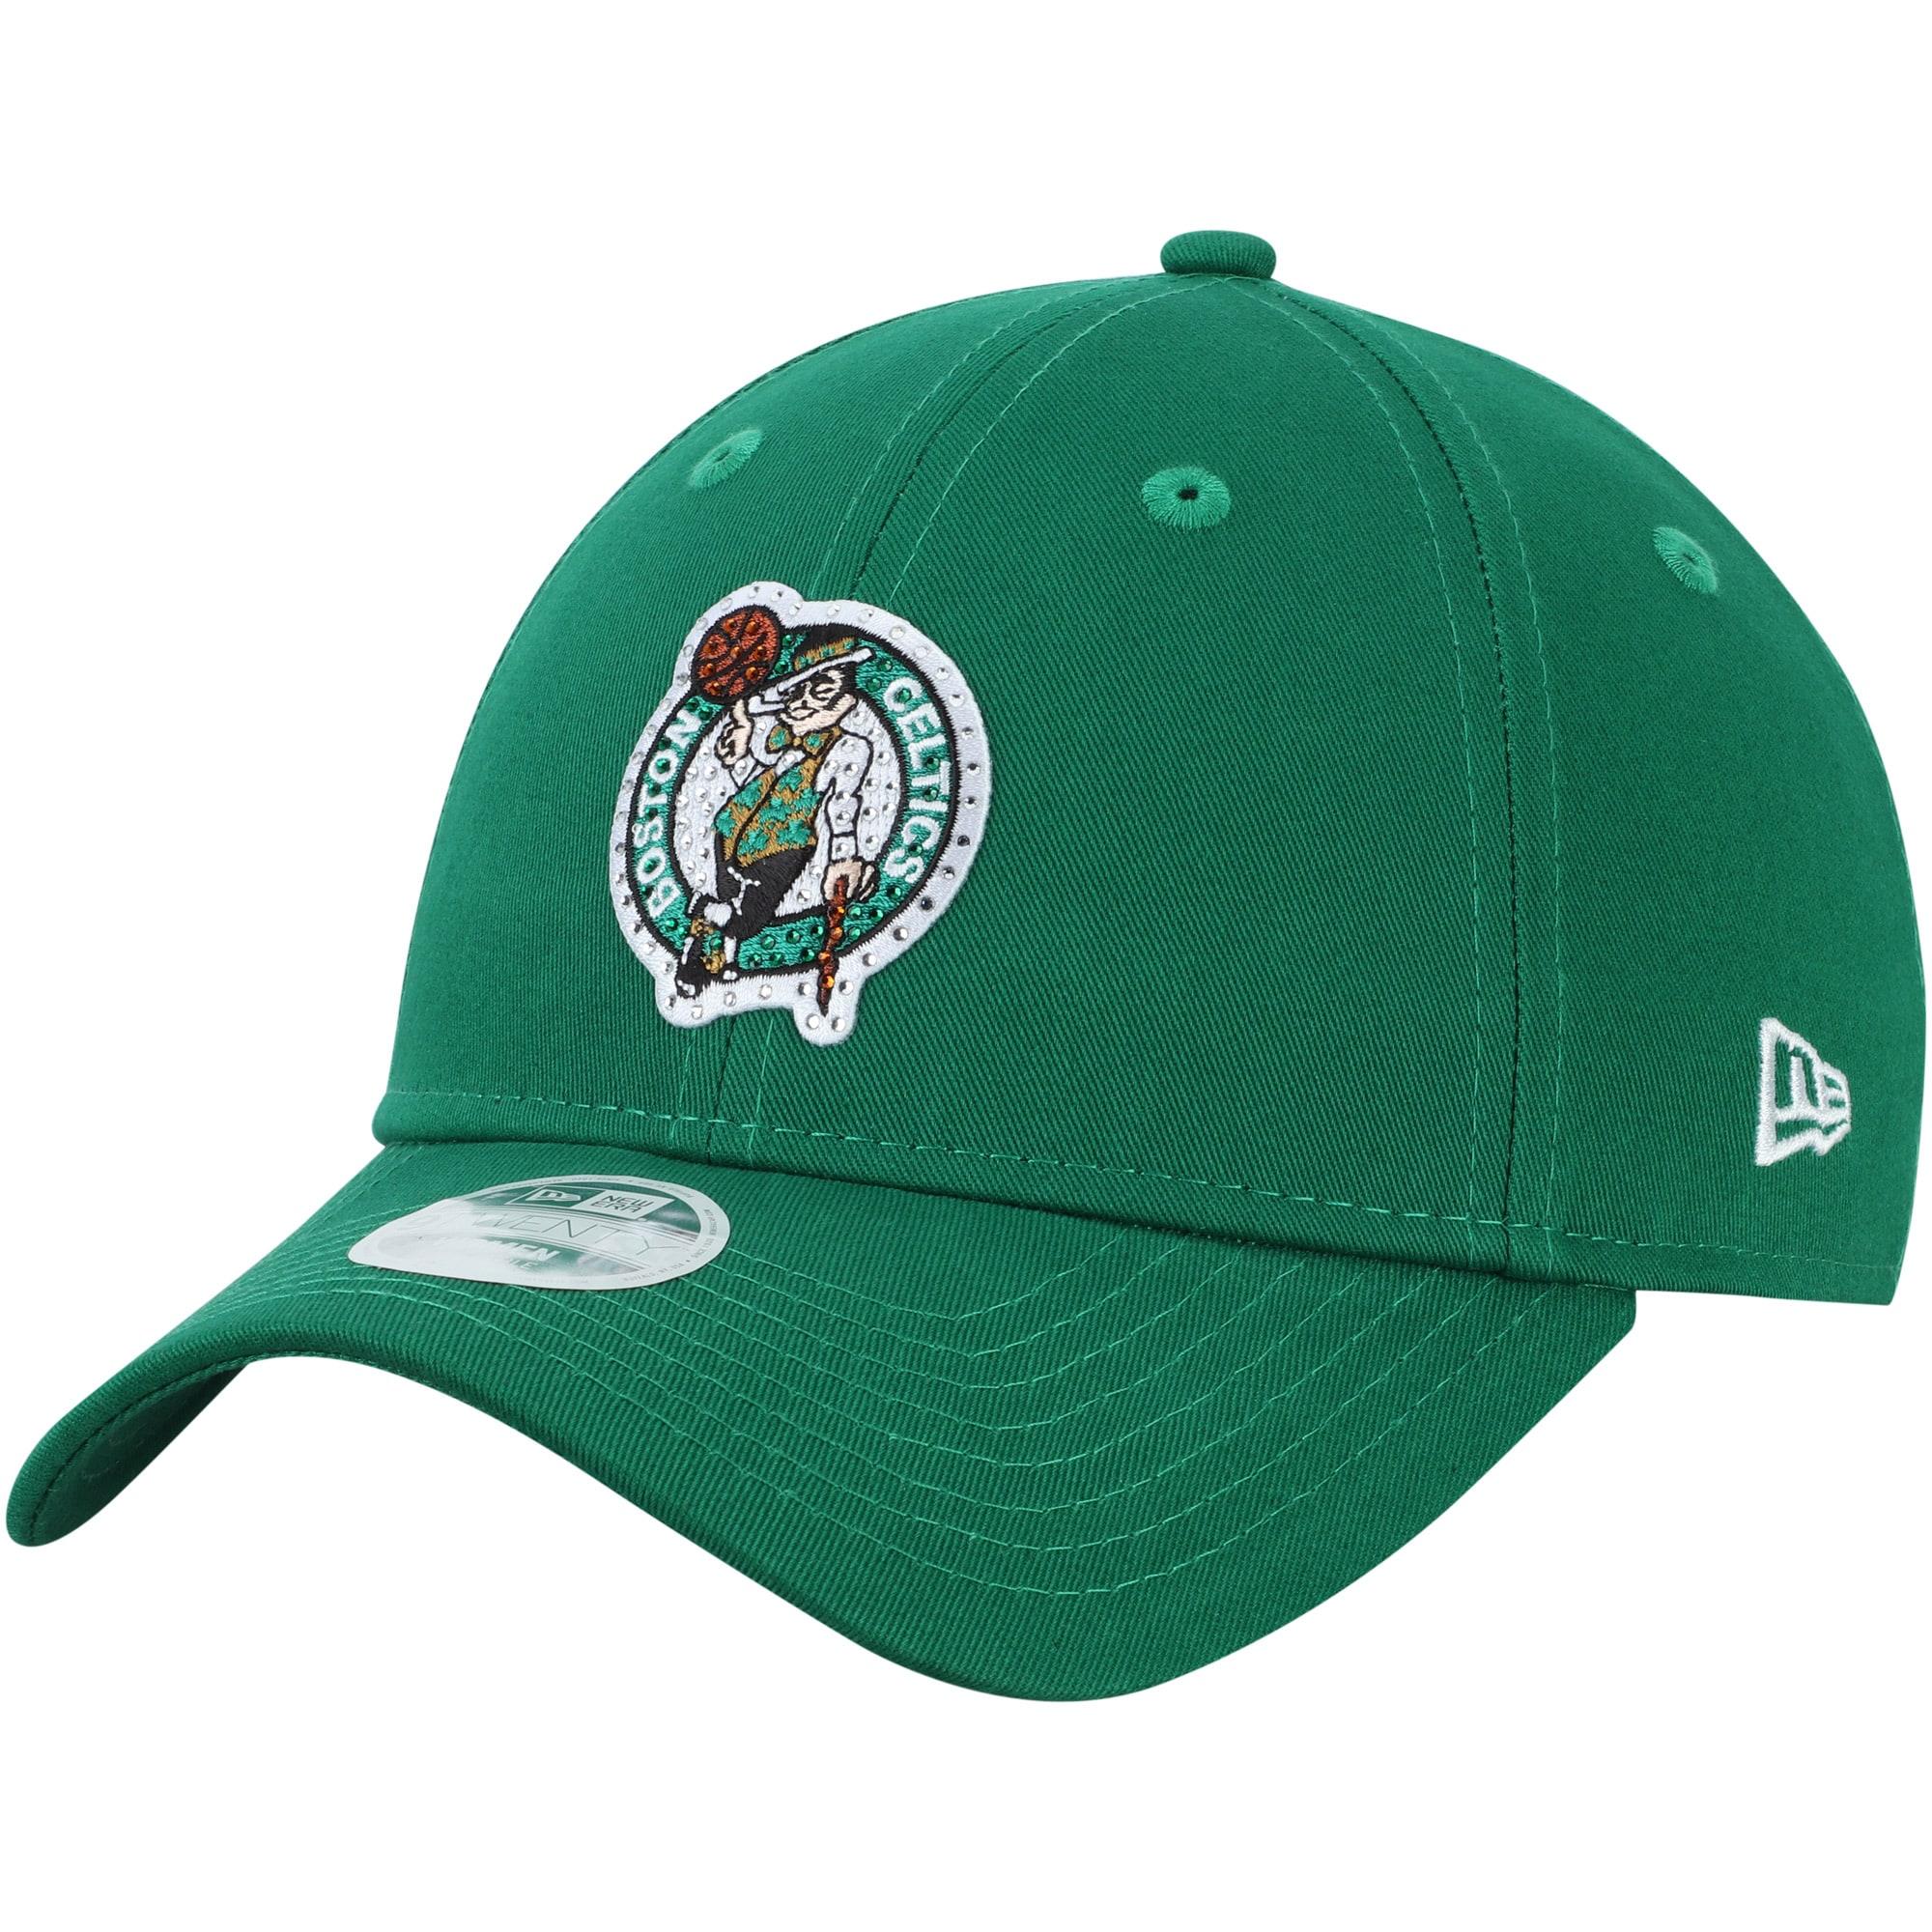 Boston Celtics New Era Women's Dazzle 9TWENTY Adjustable Hat - Green